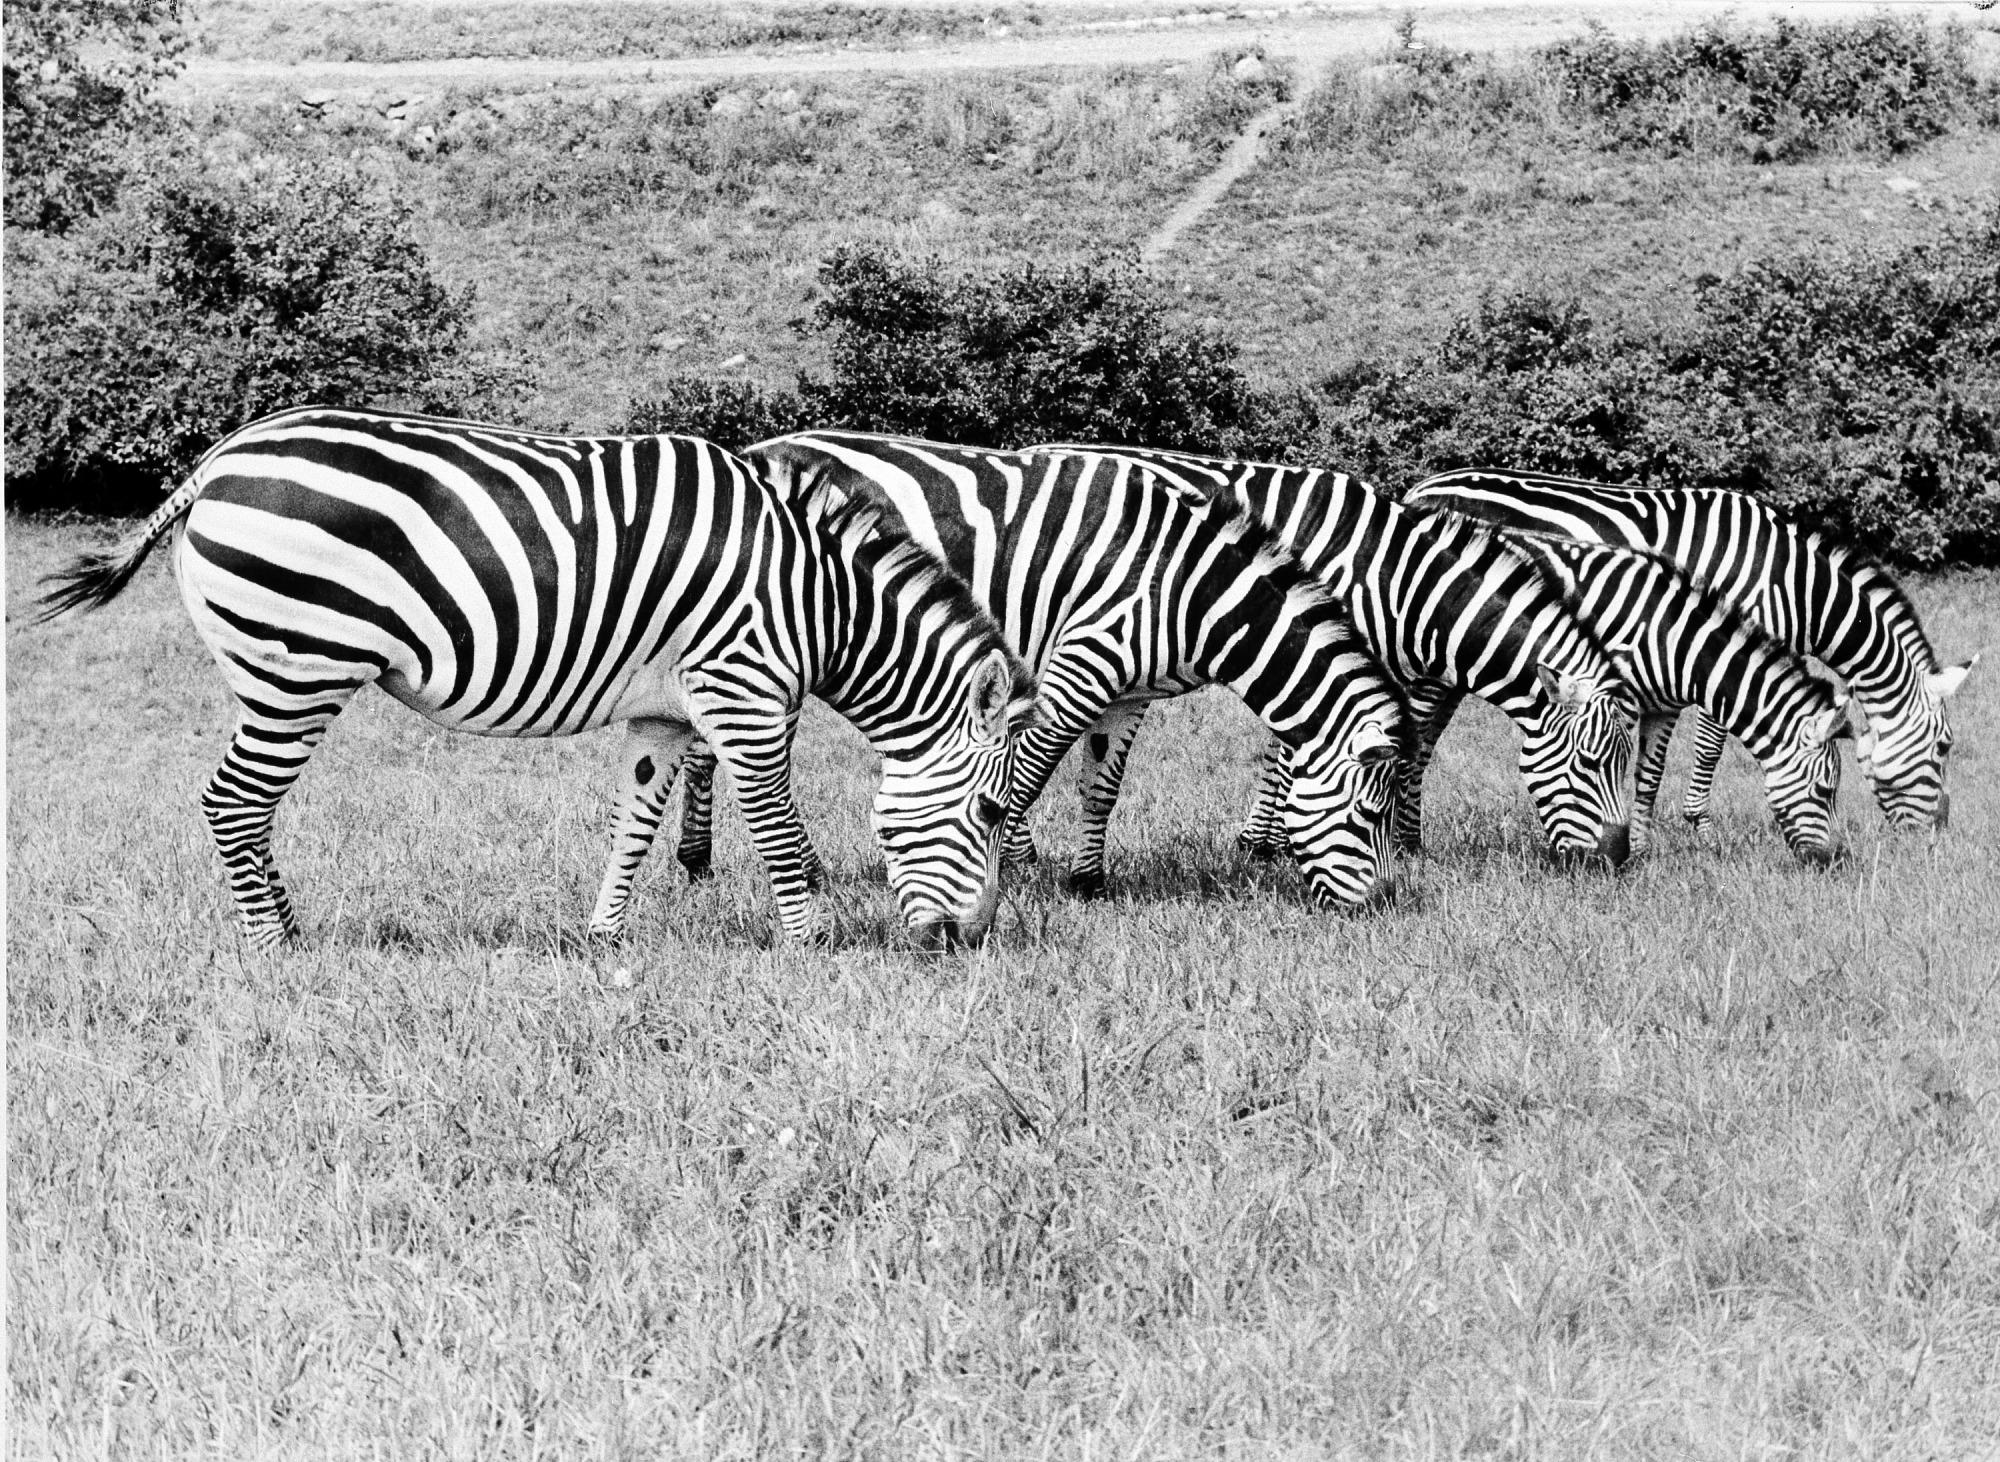 Zebras at Conservation & Research Center, Front Royal, VA